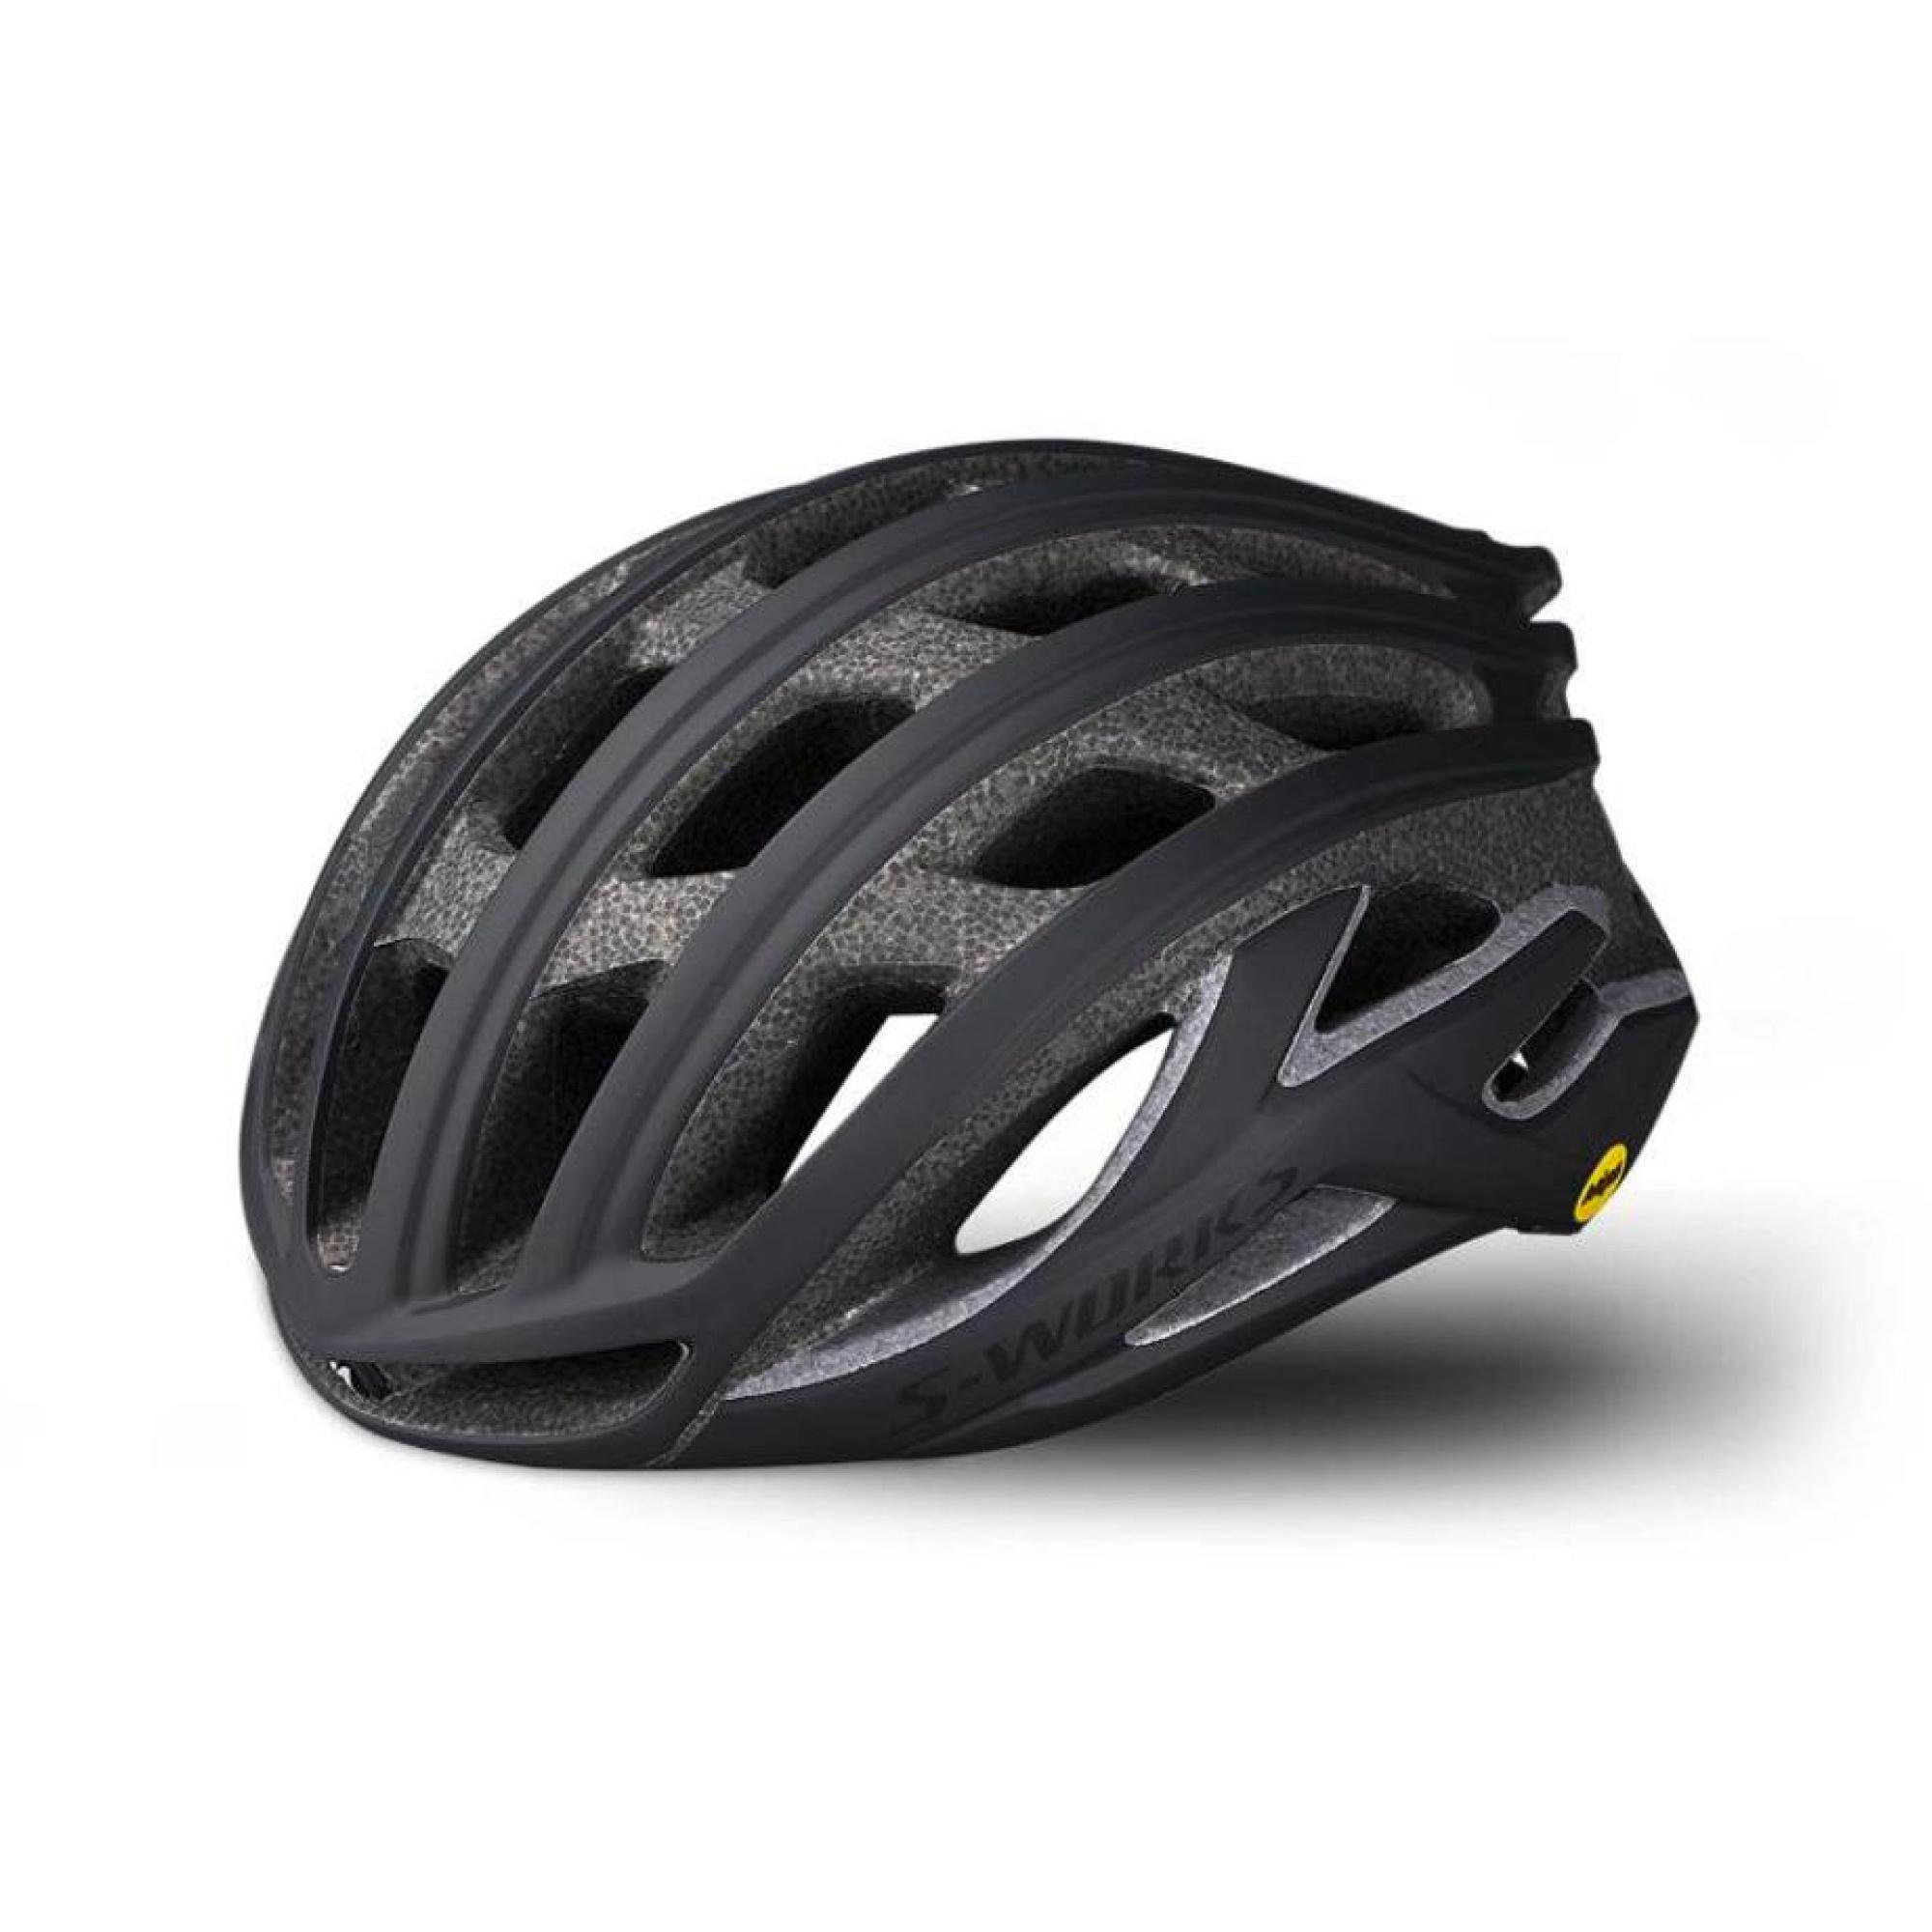 S-Works Prevail II Helmet Angi Mips-1